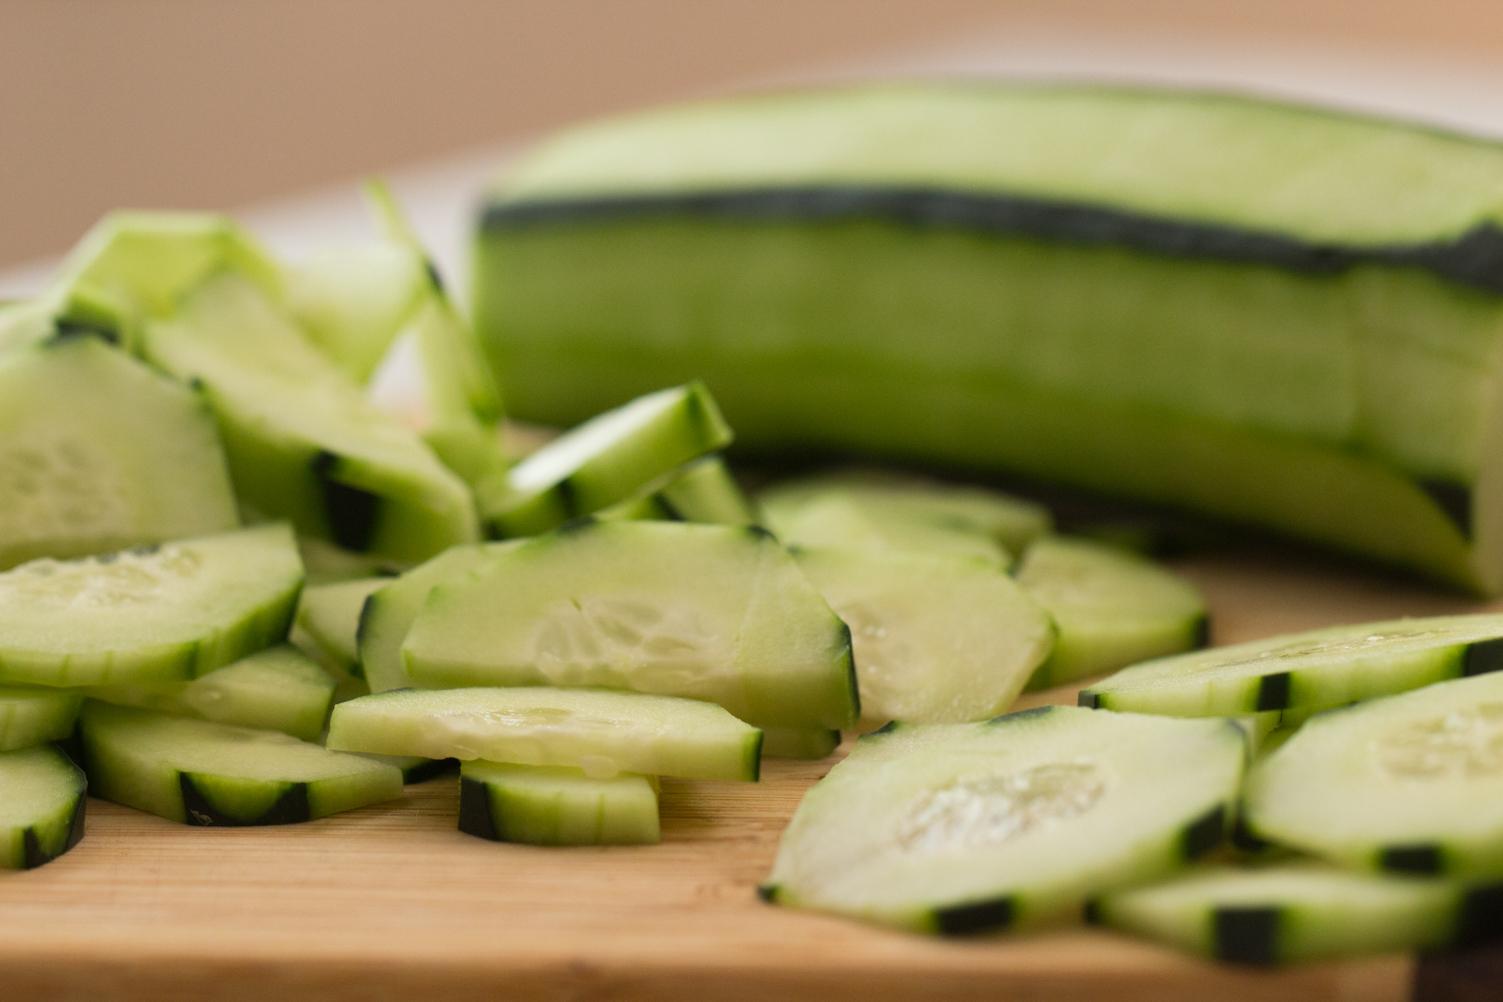 Cucumber peeled and sliced